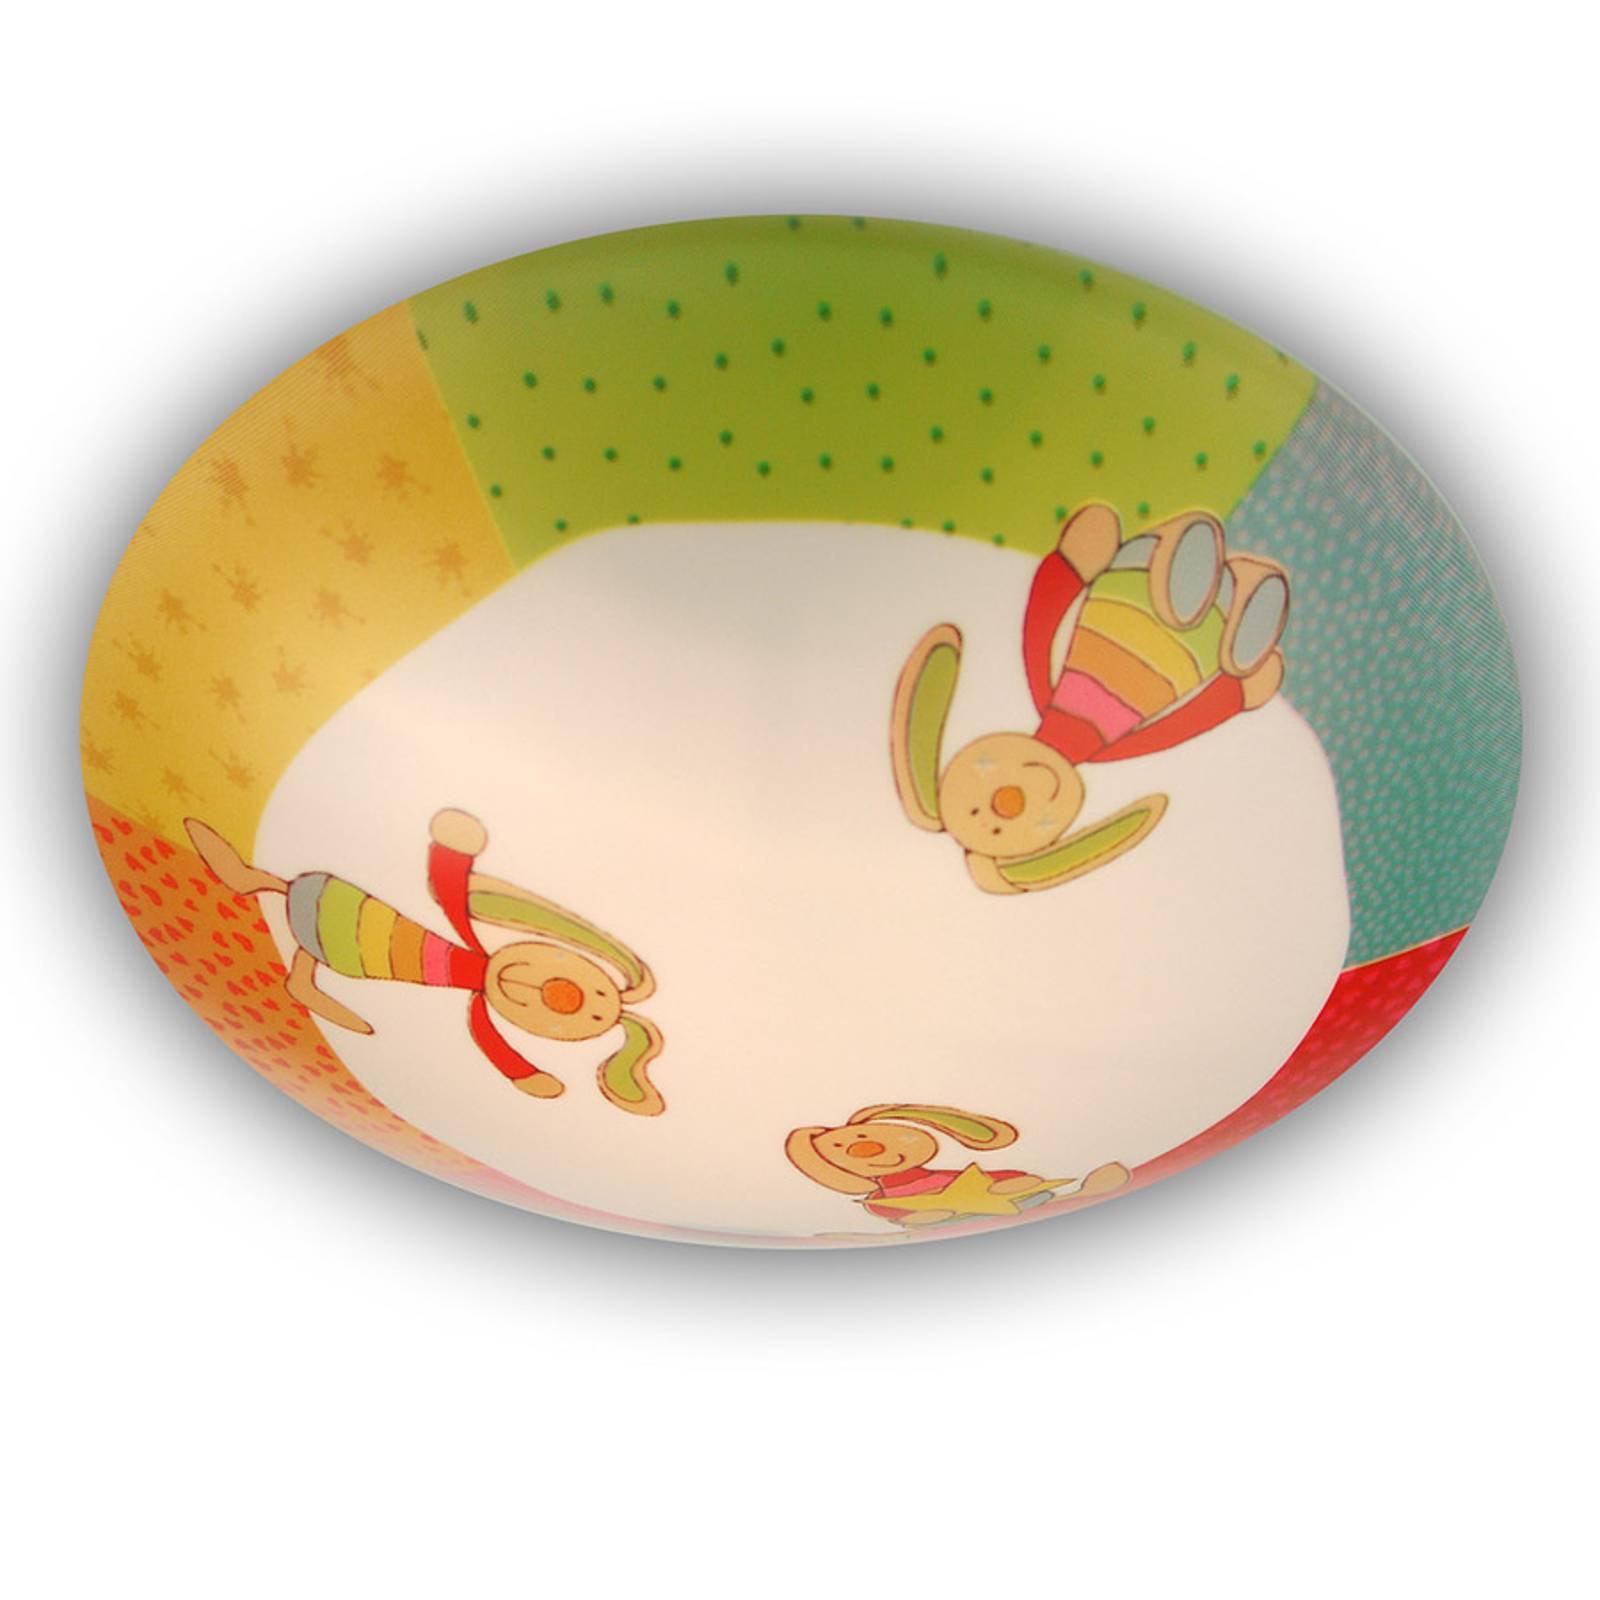 Rainbow Rabbit - rund taklampe til barnerommet